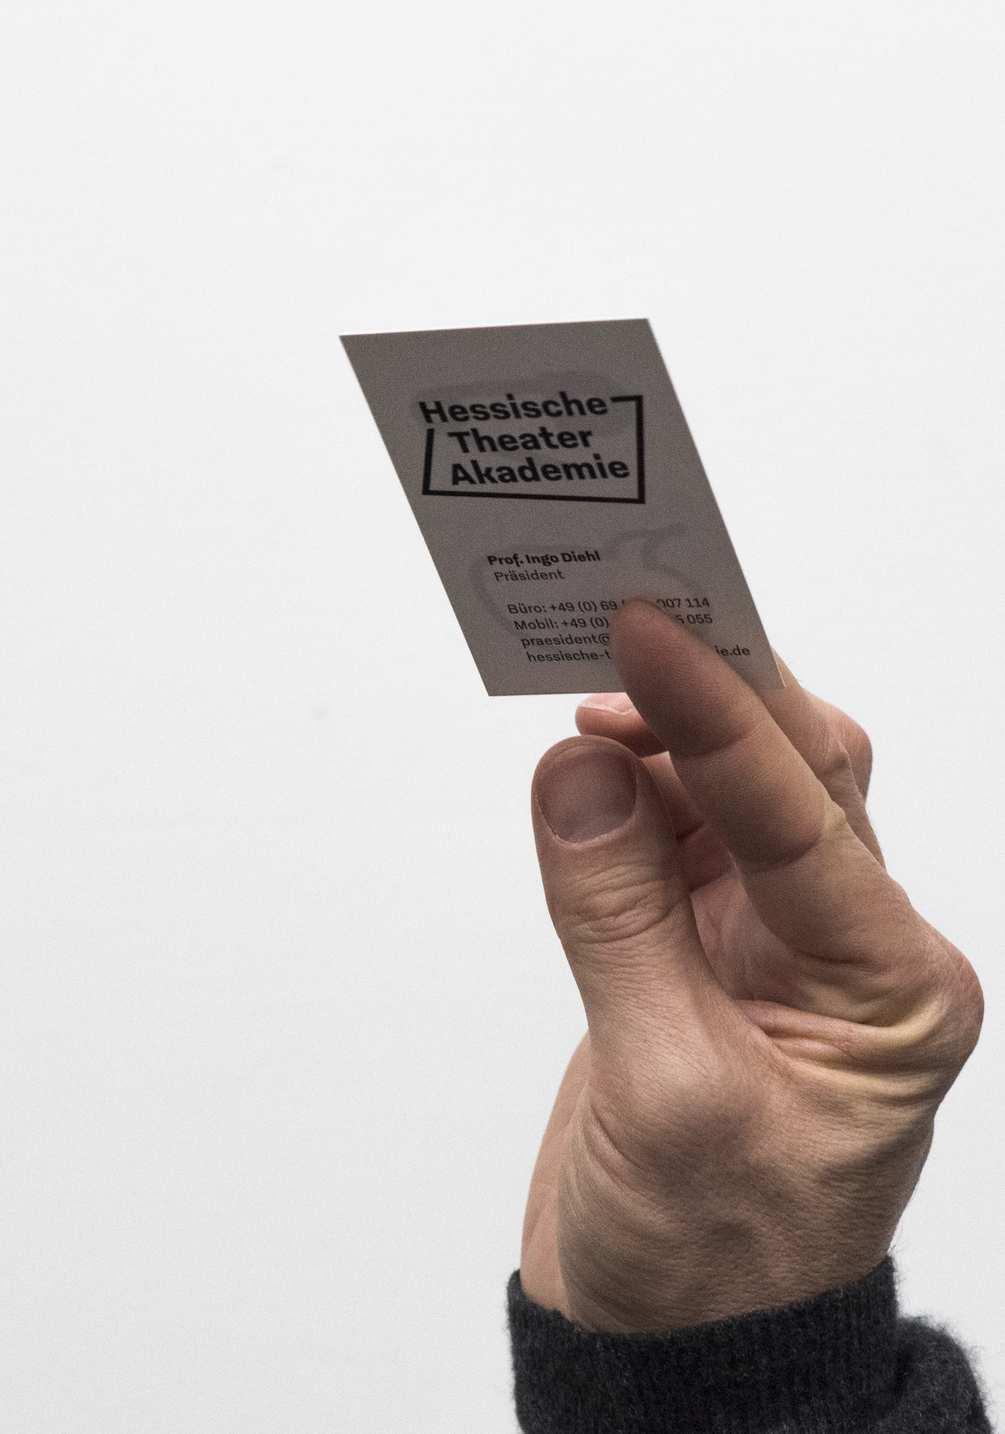 hta-business-card-8-1005x1433px